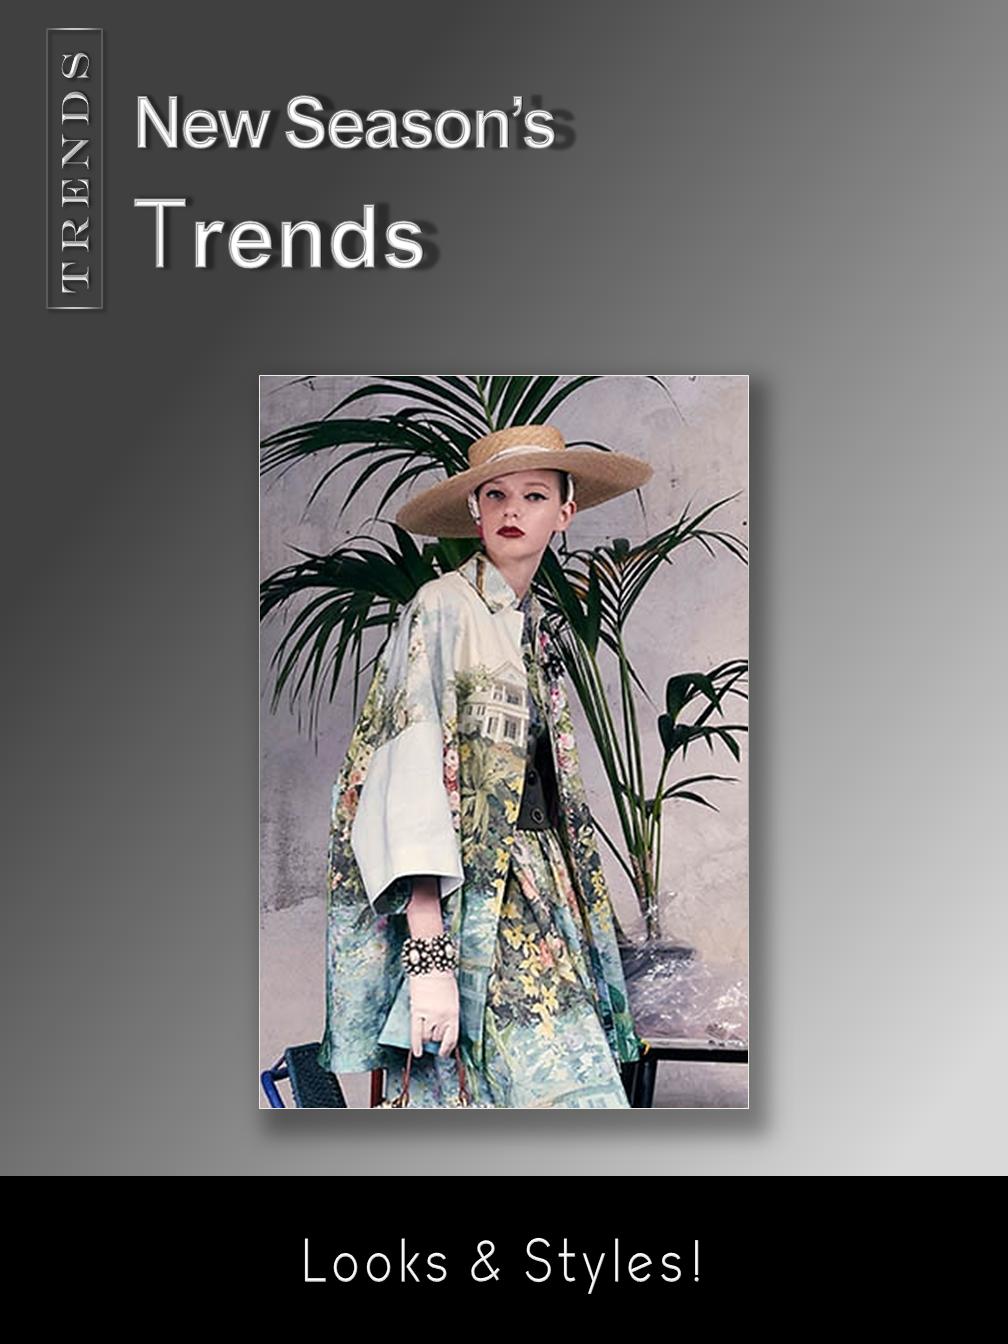 Season's Trends